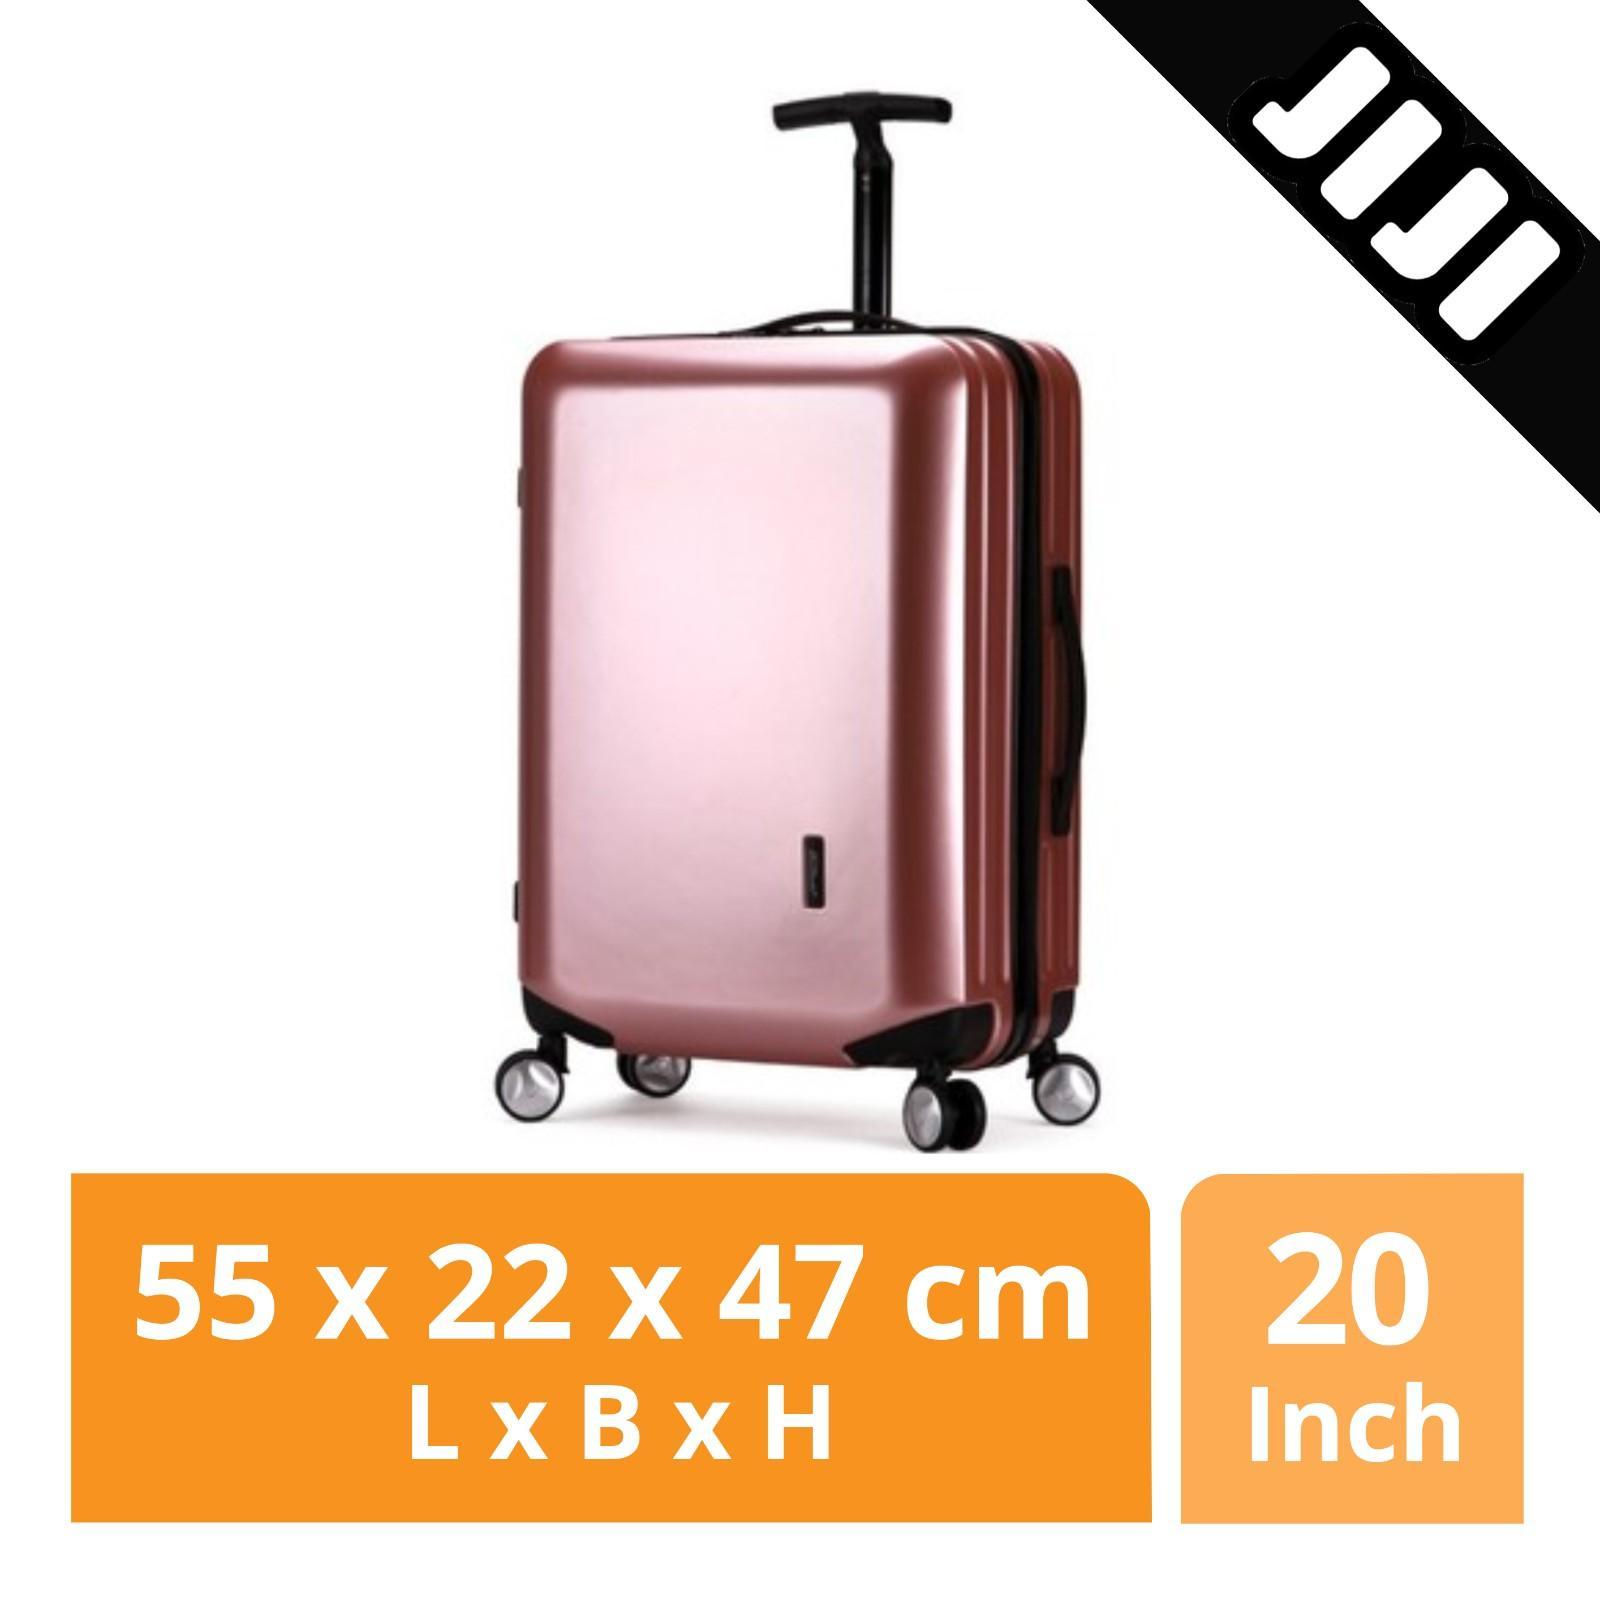 Jiji T Handle Business Luggage 20/24 Inch - Lightweight / Travel / Traveling (sg) By Jiji.